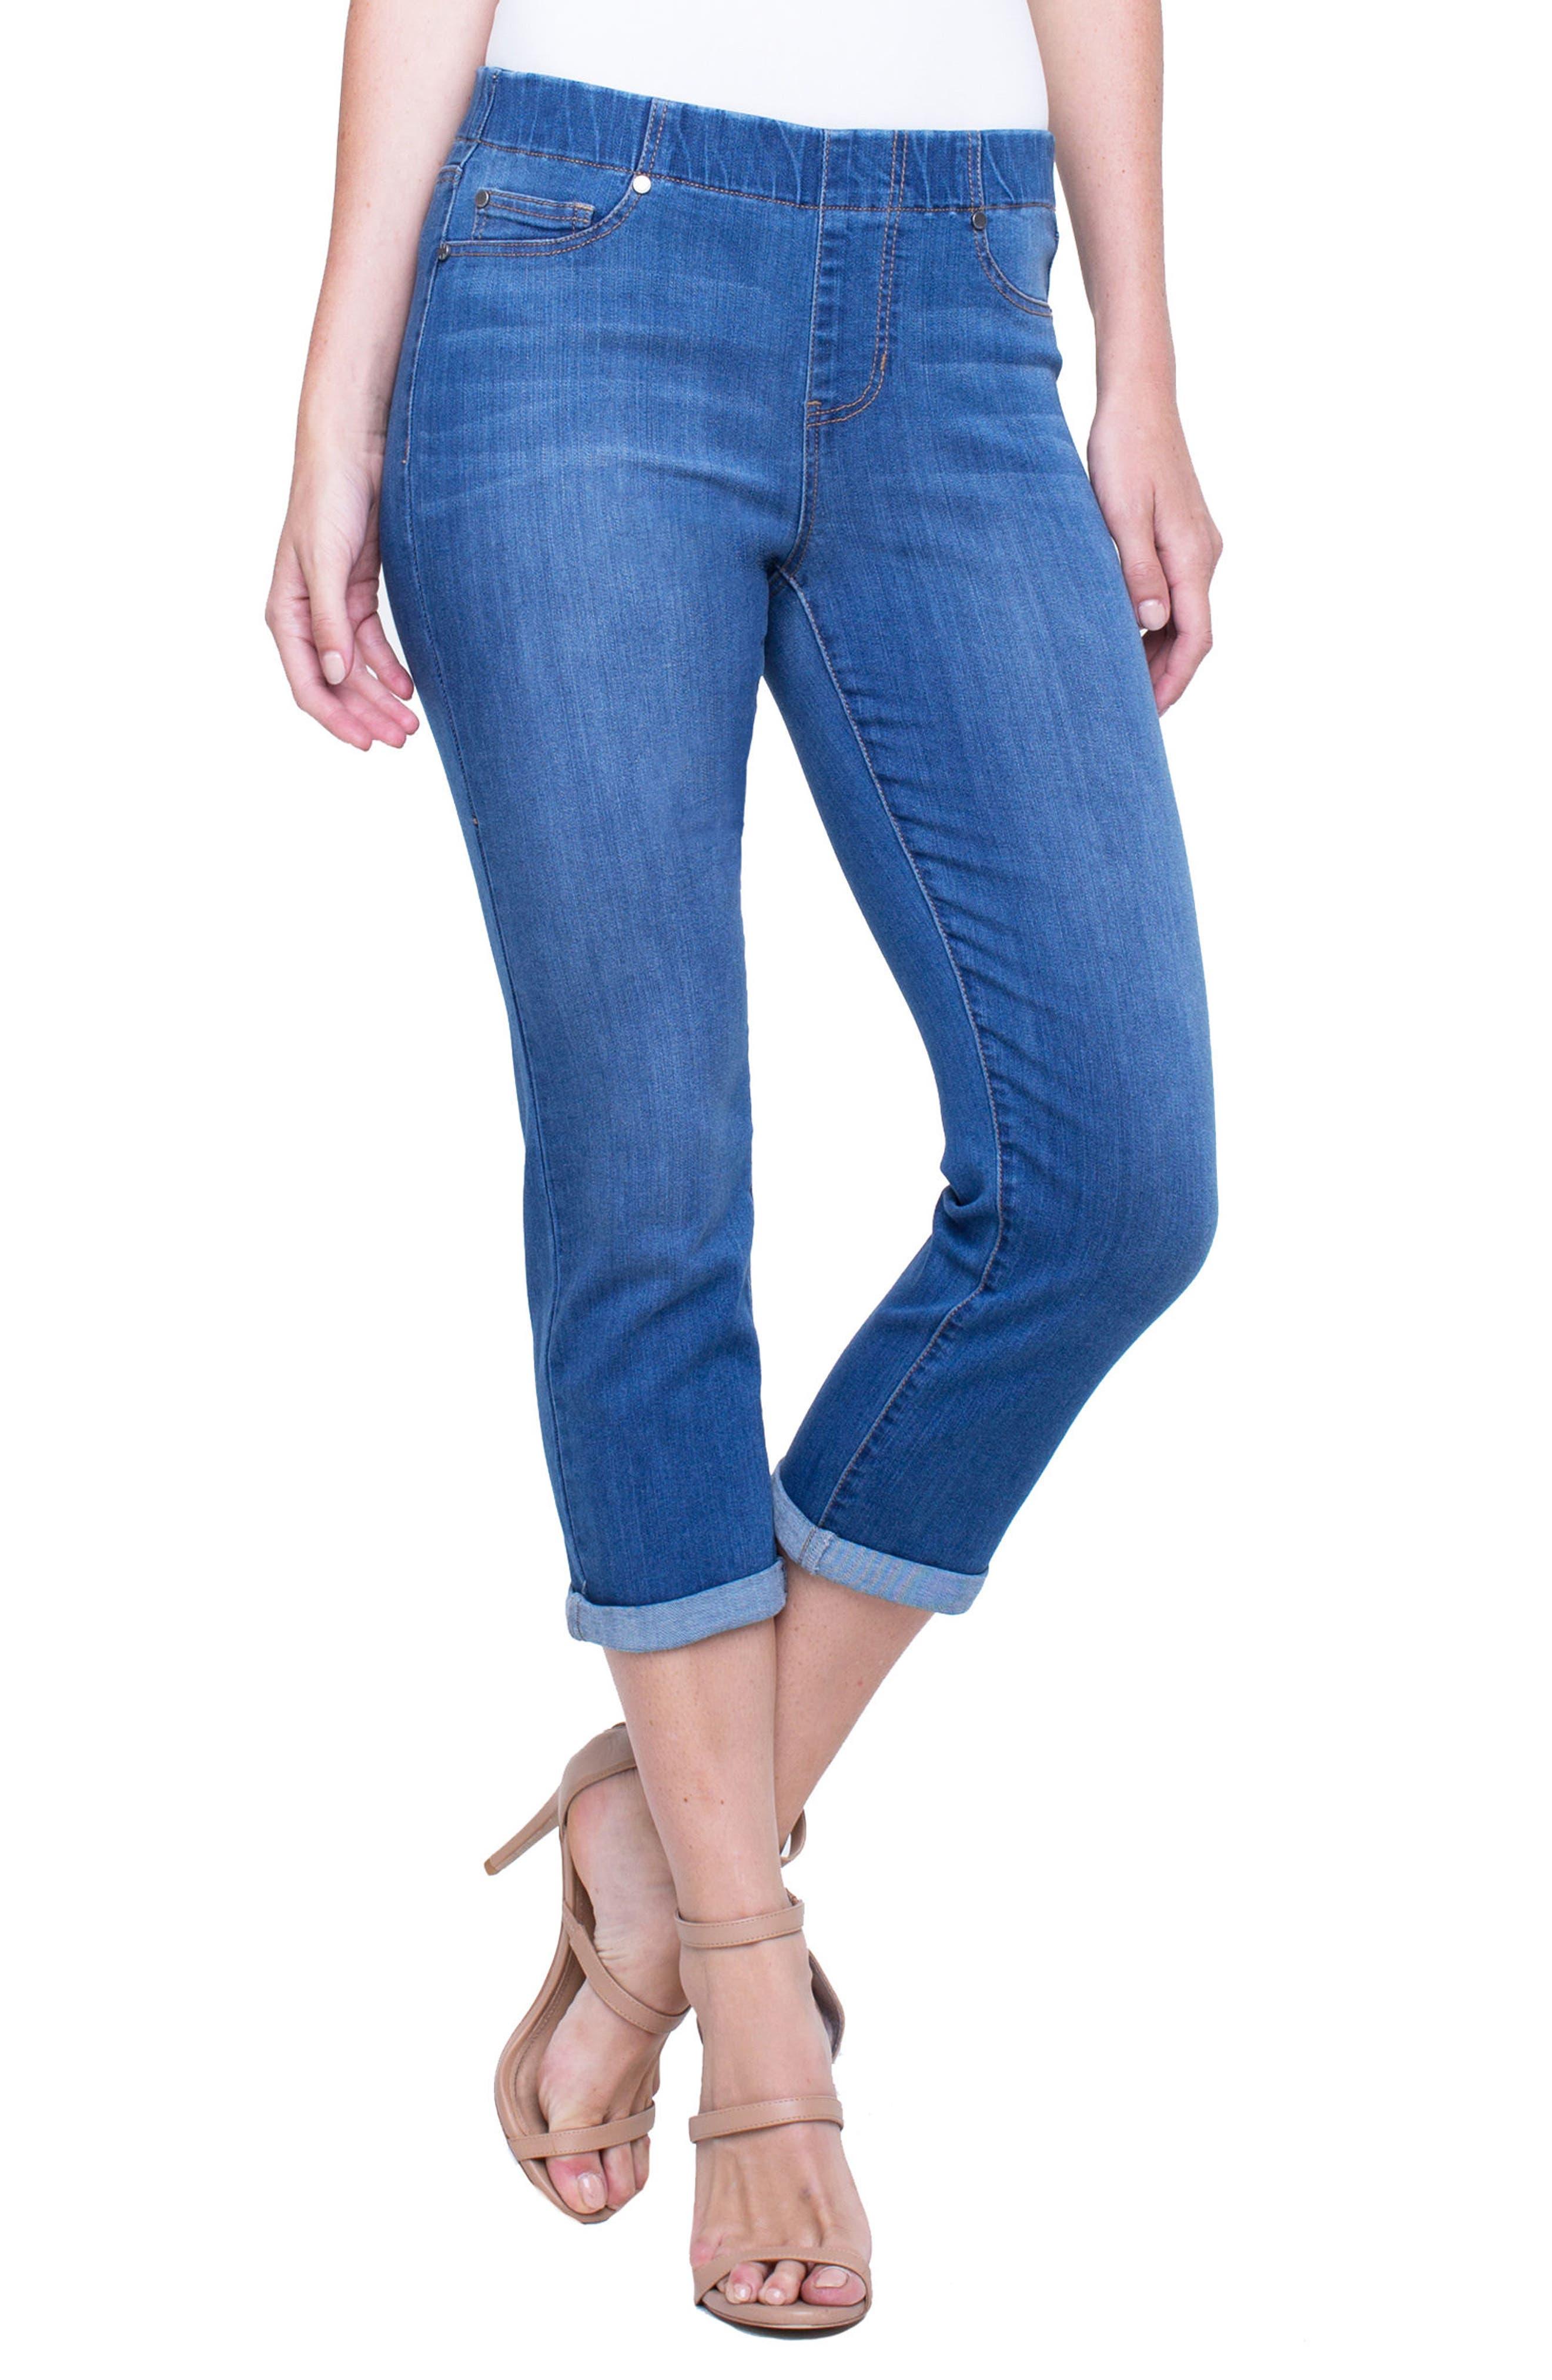 Chloe Pull-On Roll Cuff Capri Jeans